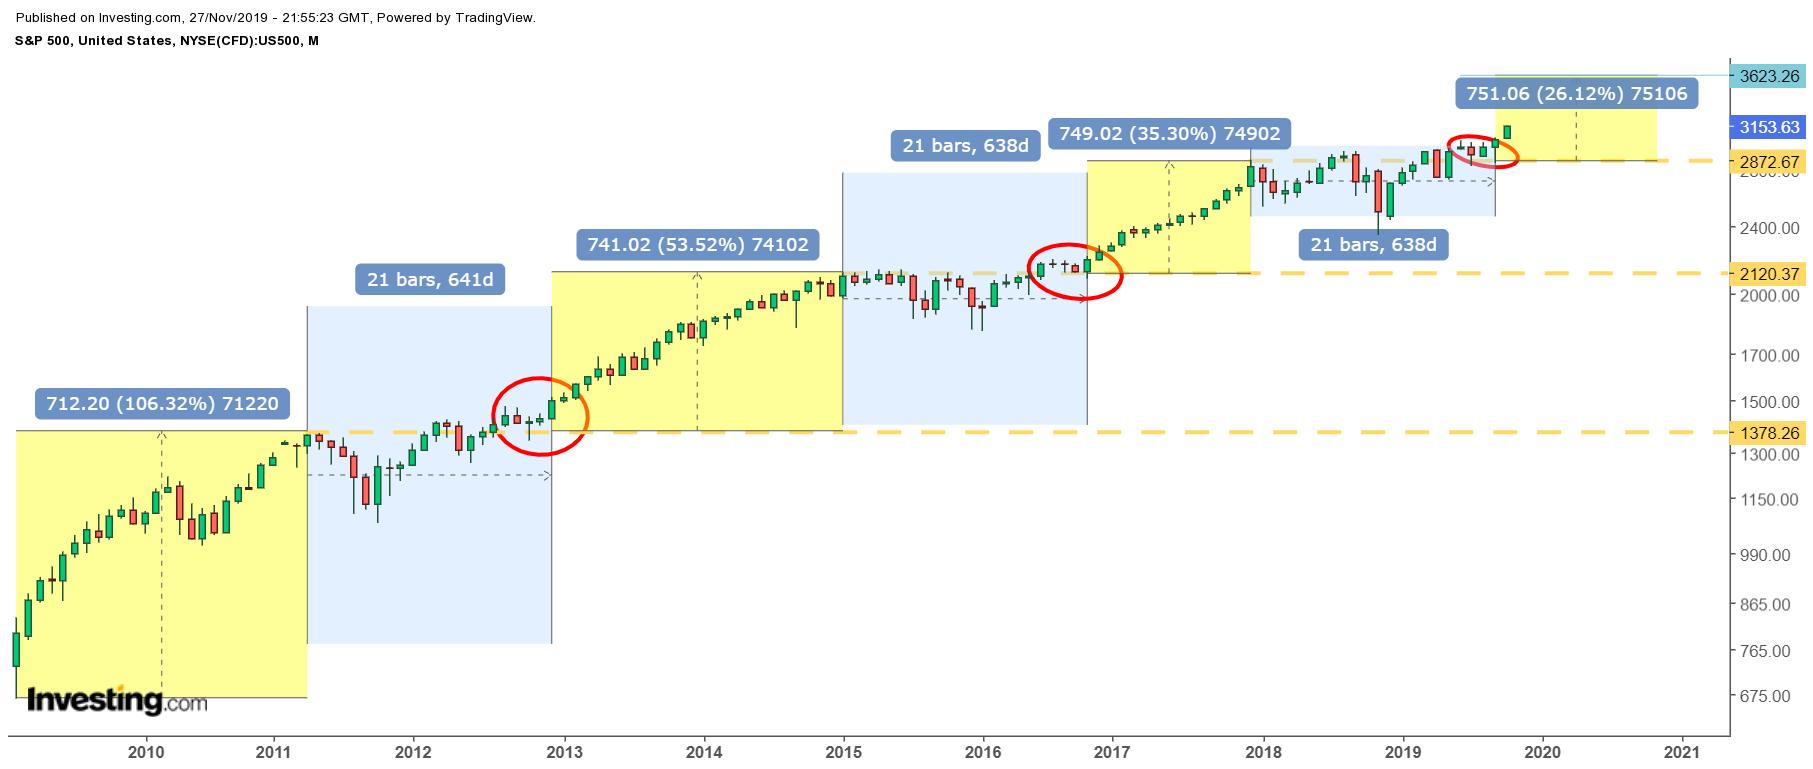 S&P 500 Monthly Price Chart